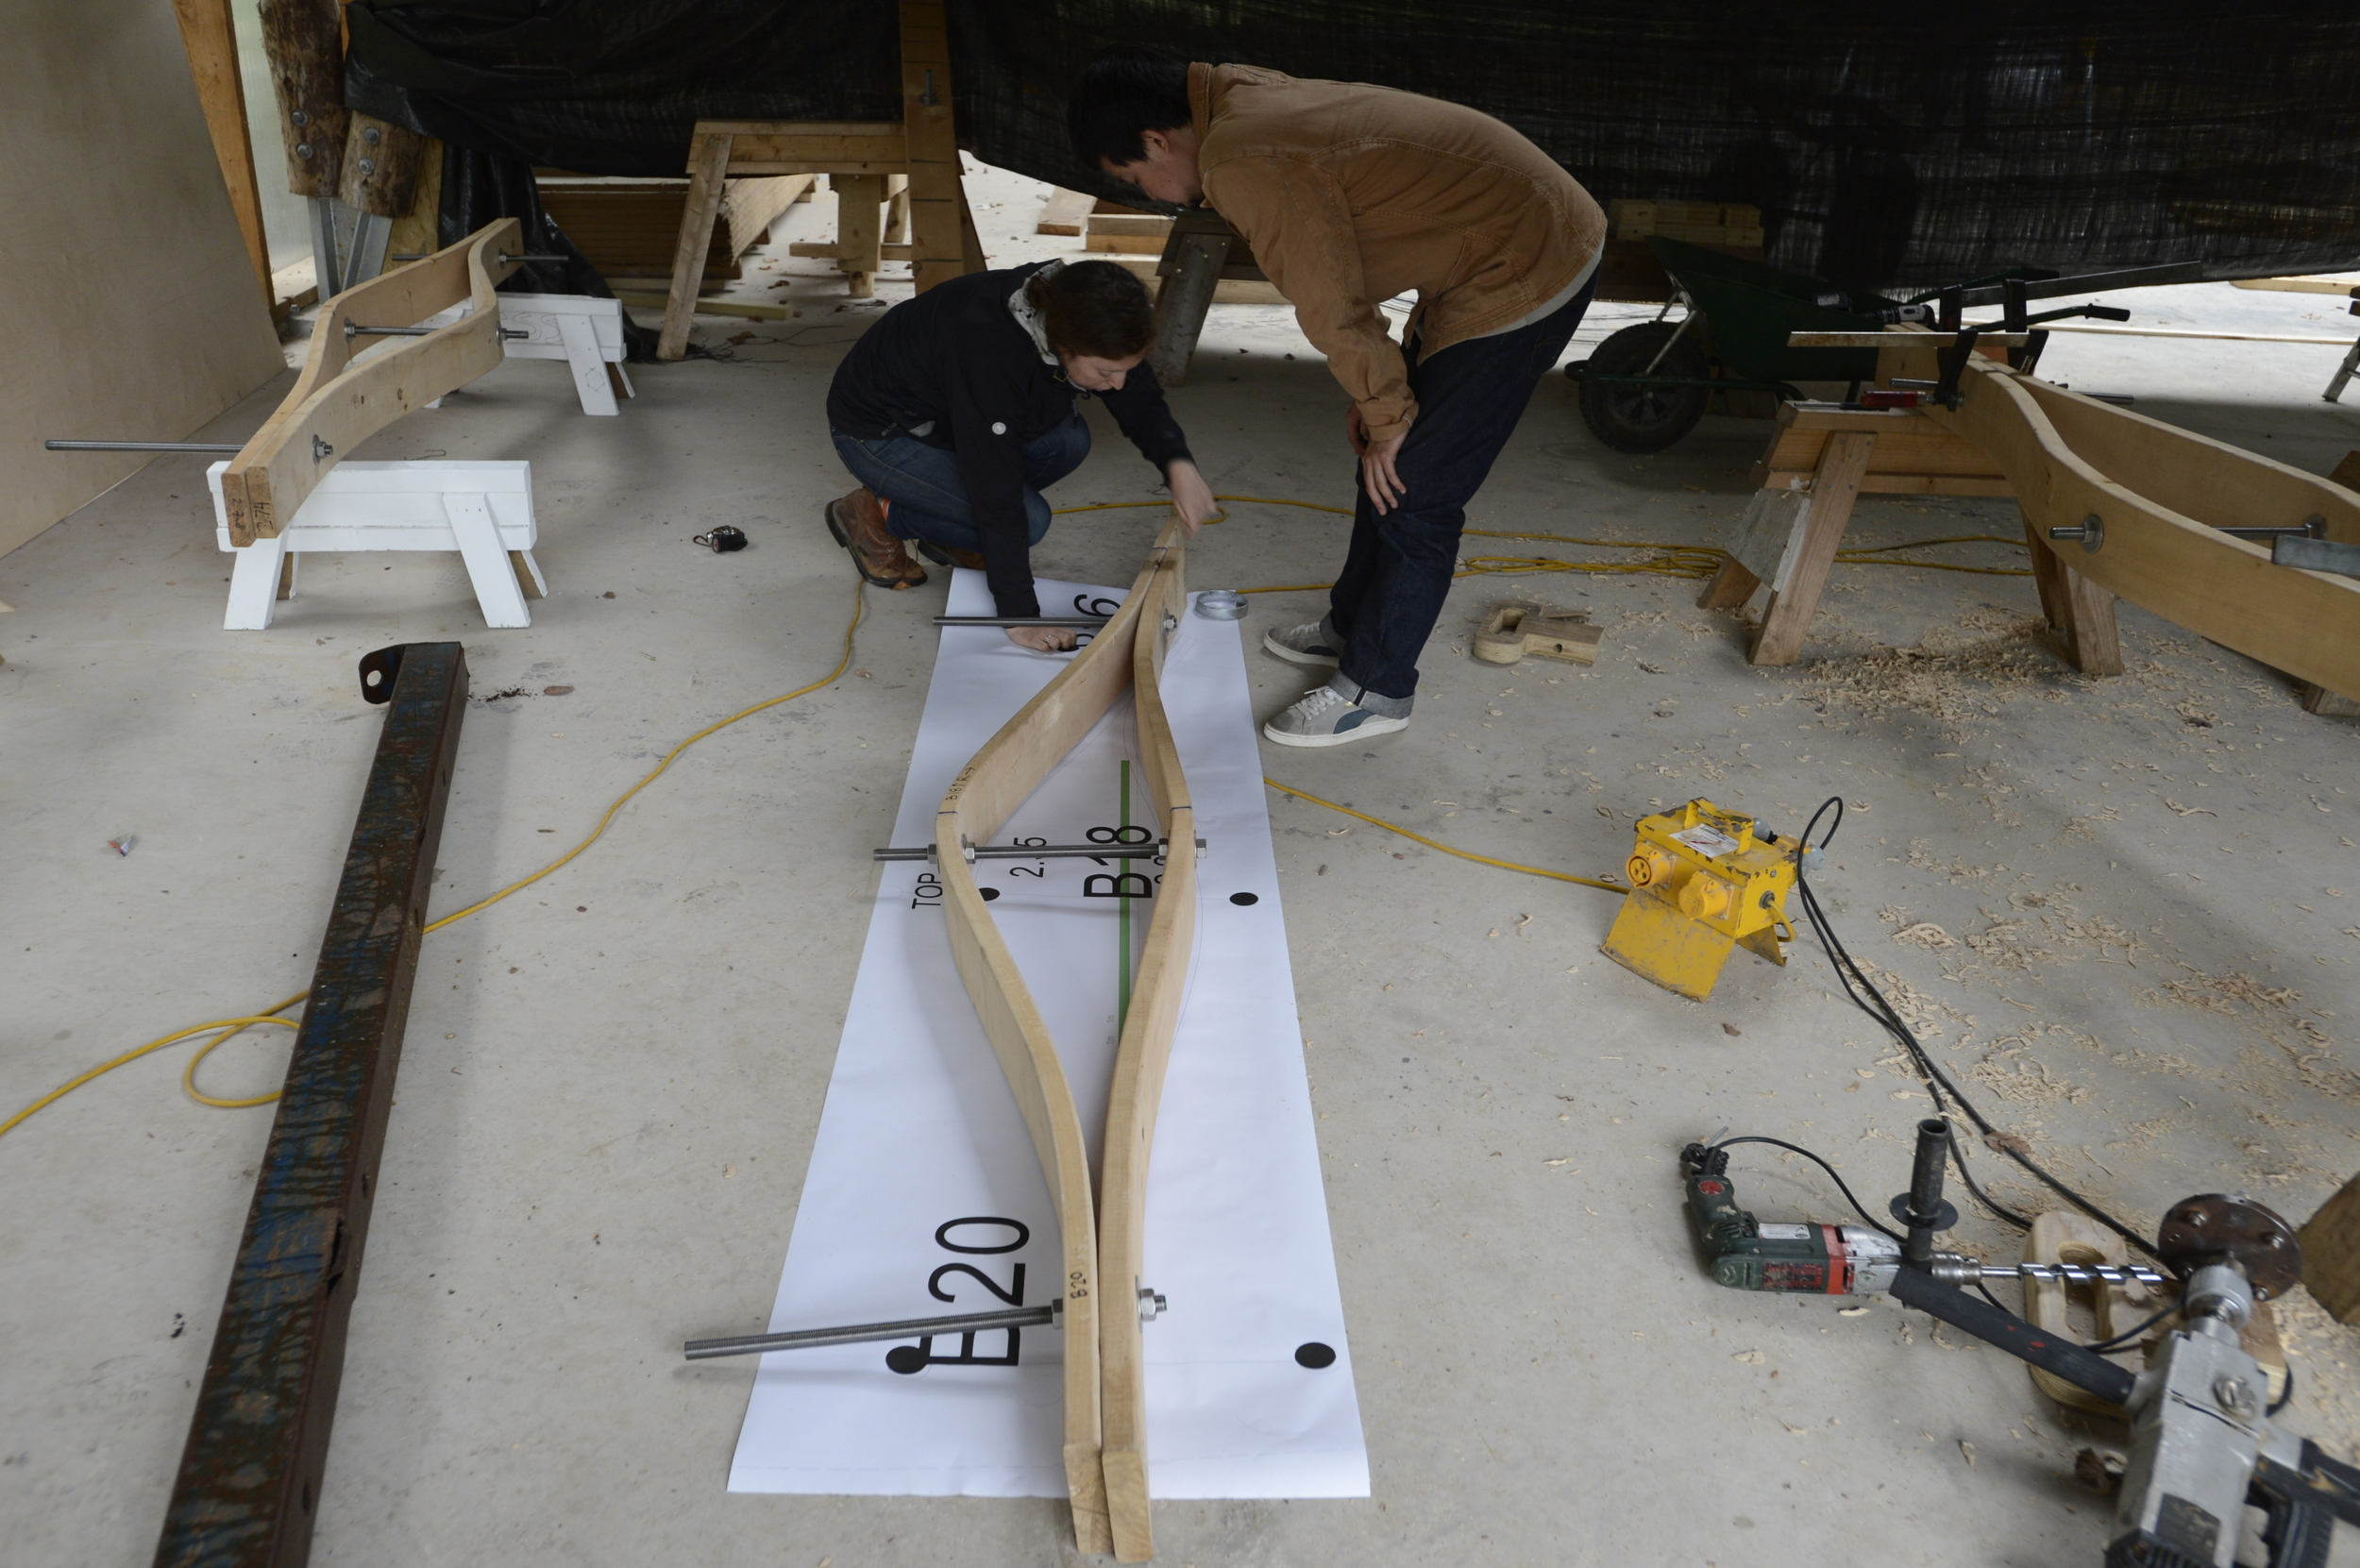 Hooke_Park_Design_&_Make_Timber_Seasoning_Shelter_bending_wood_on_the_jig_VB_2013_07_29_0002.JPG